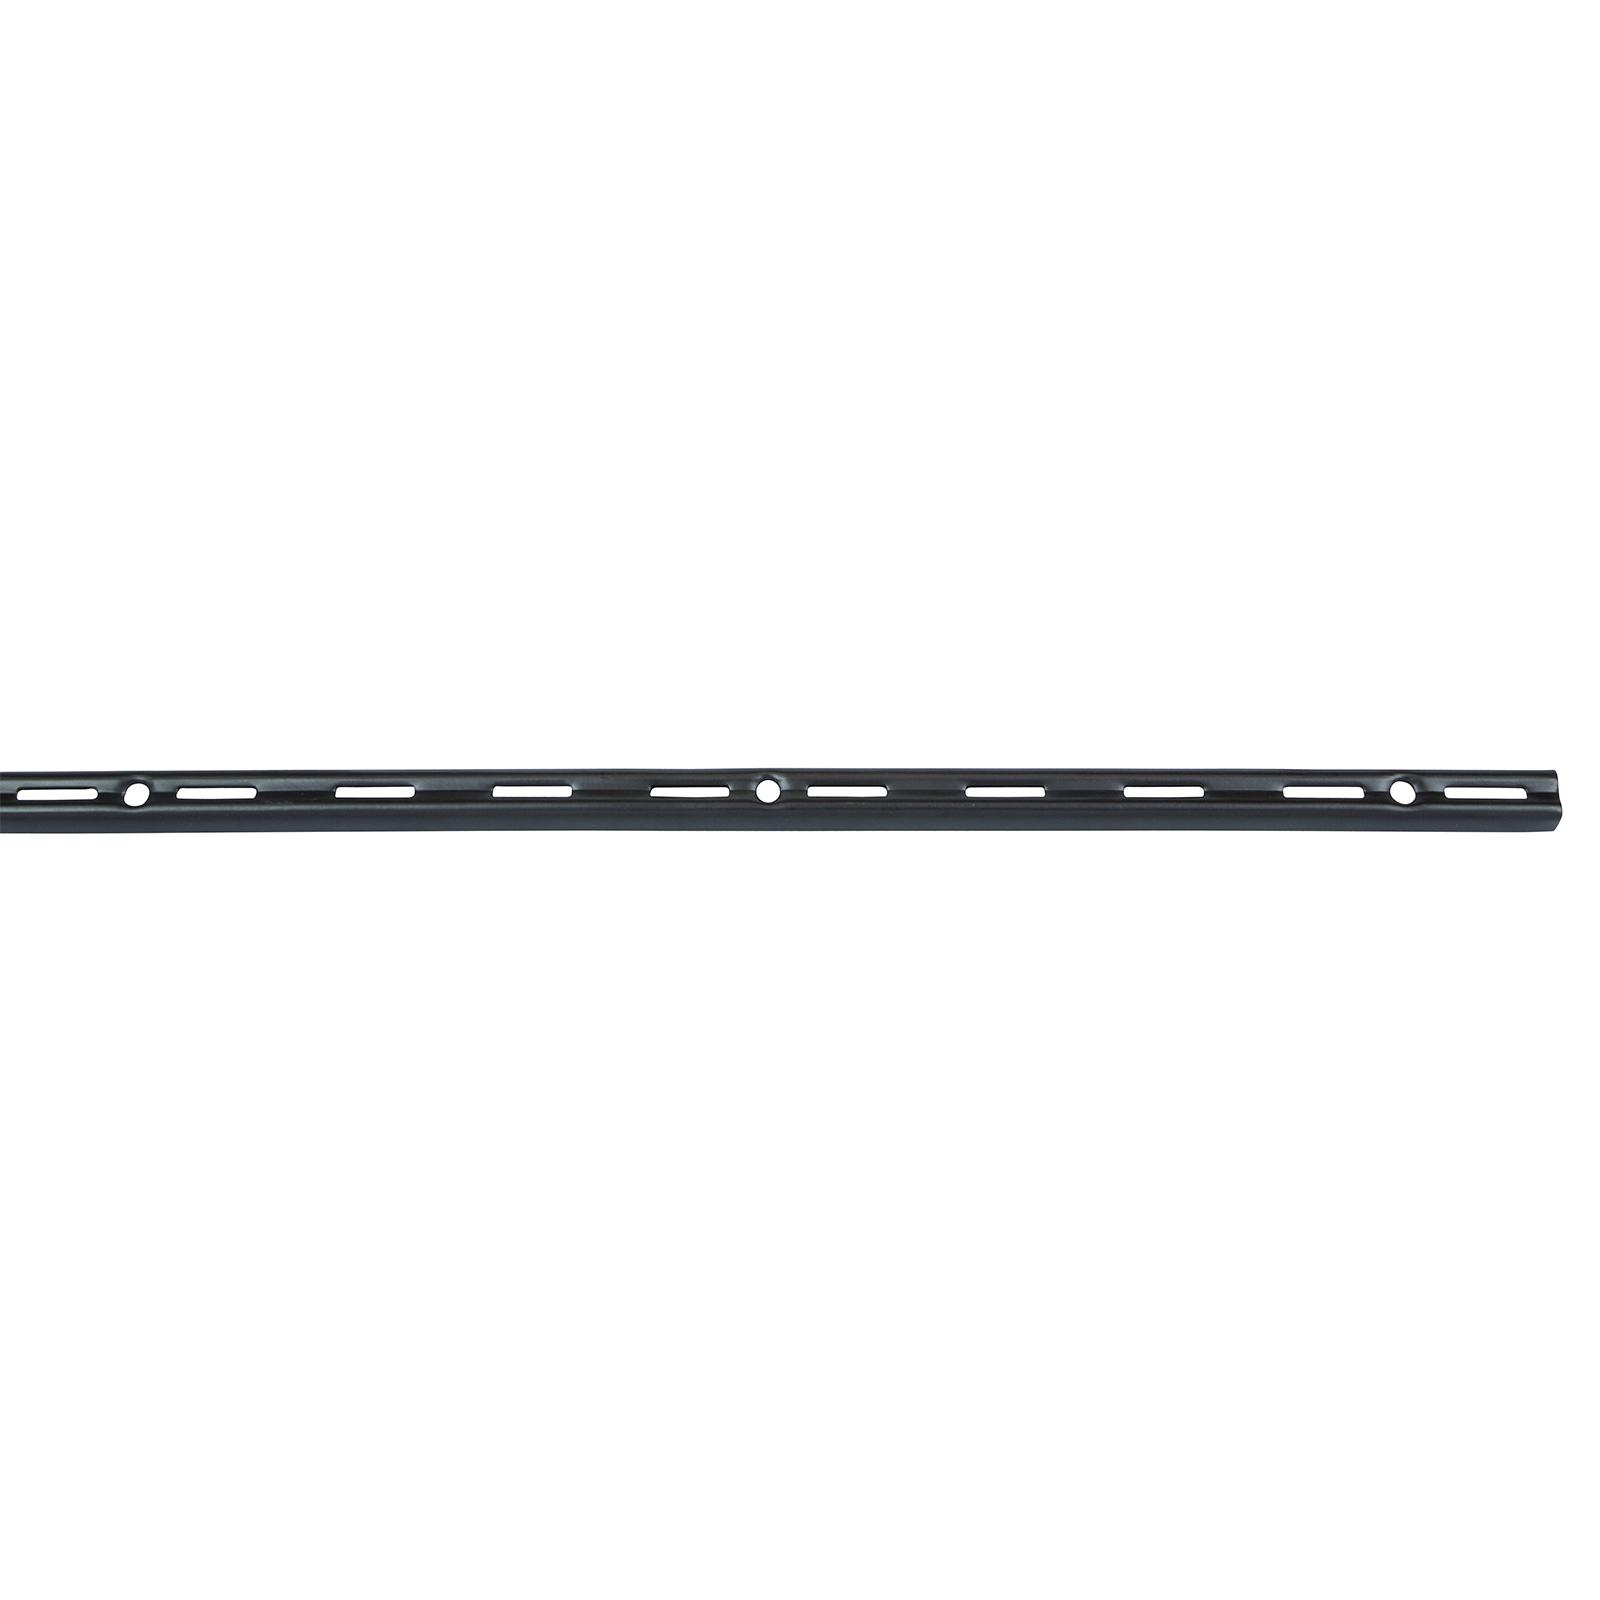 Flexi Storage 1000mm Black Single Slot Upright